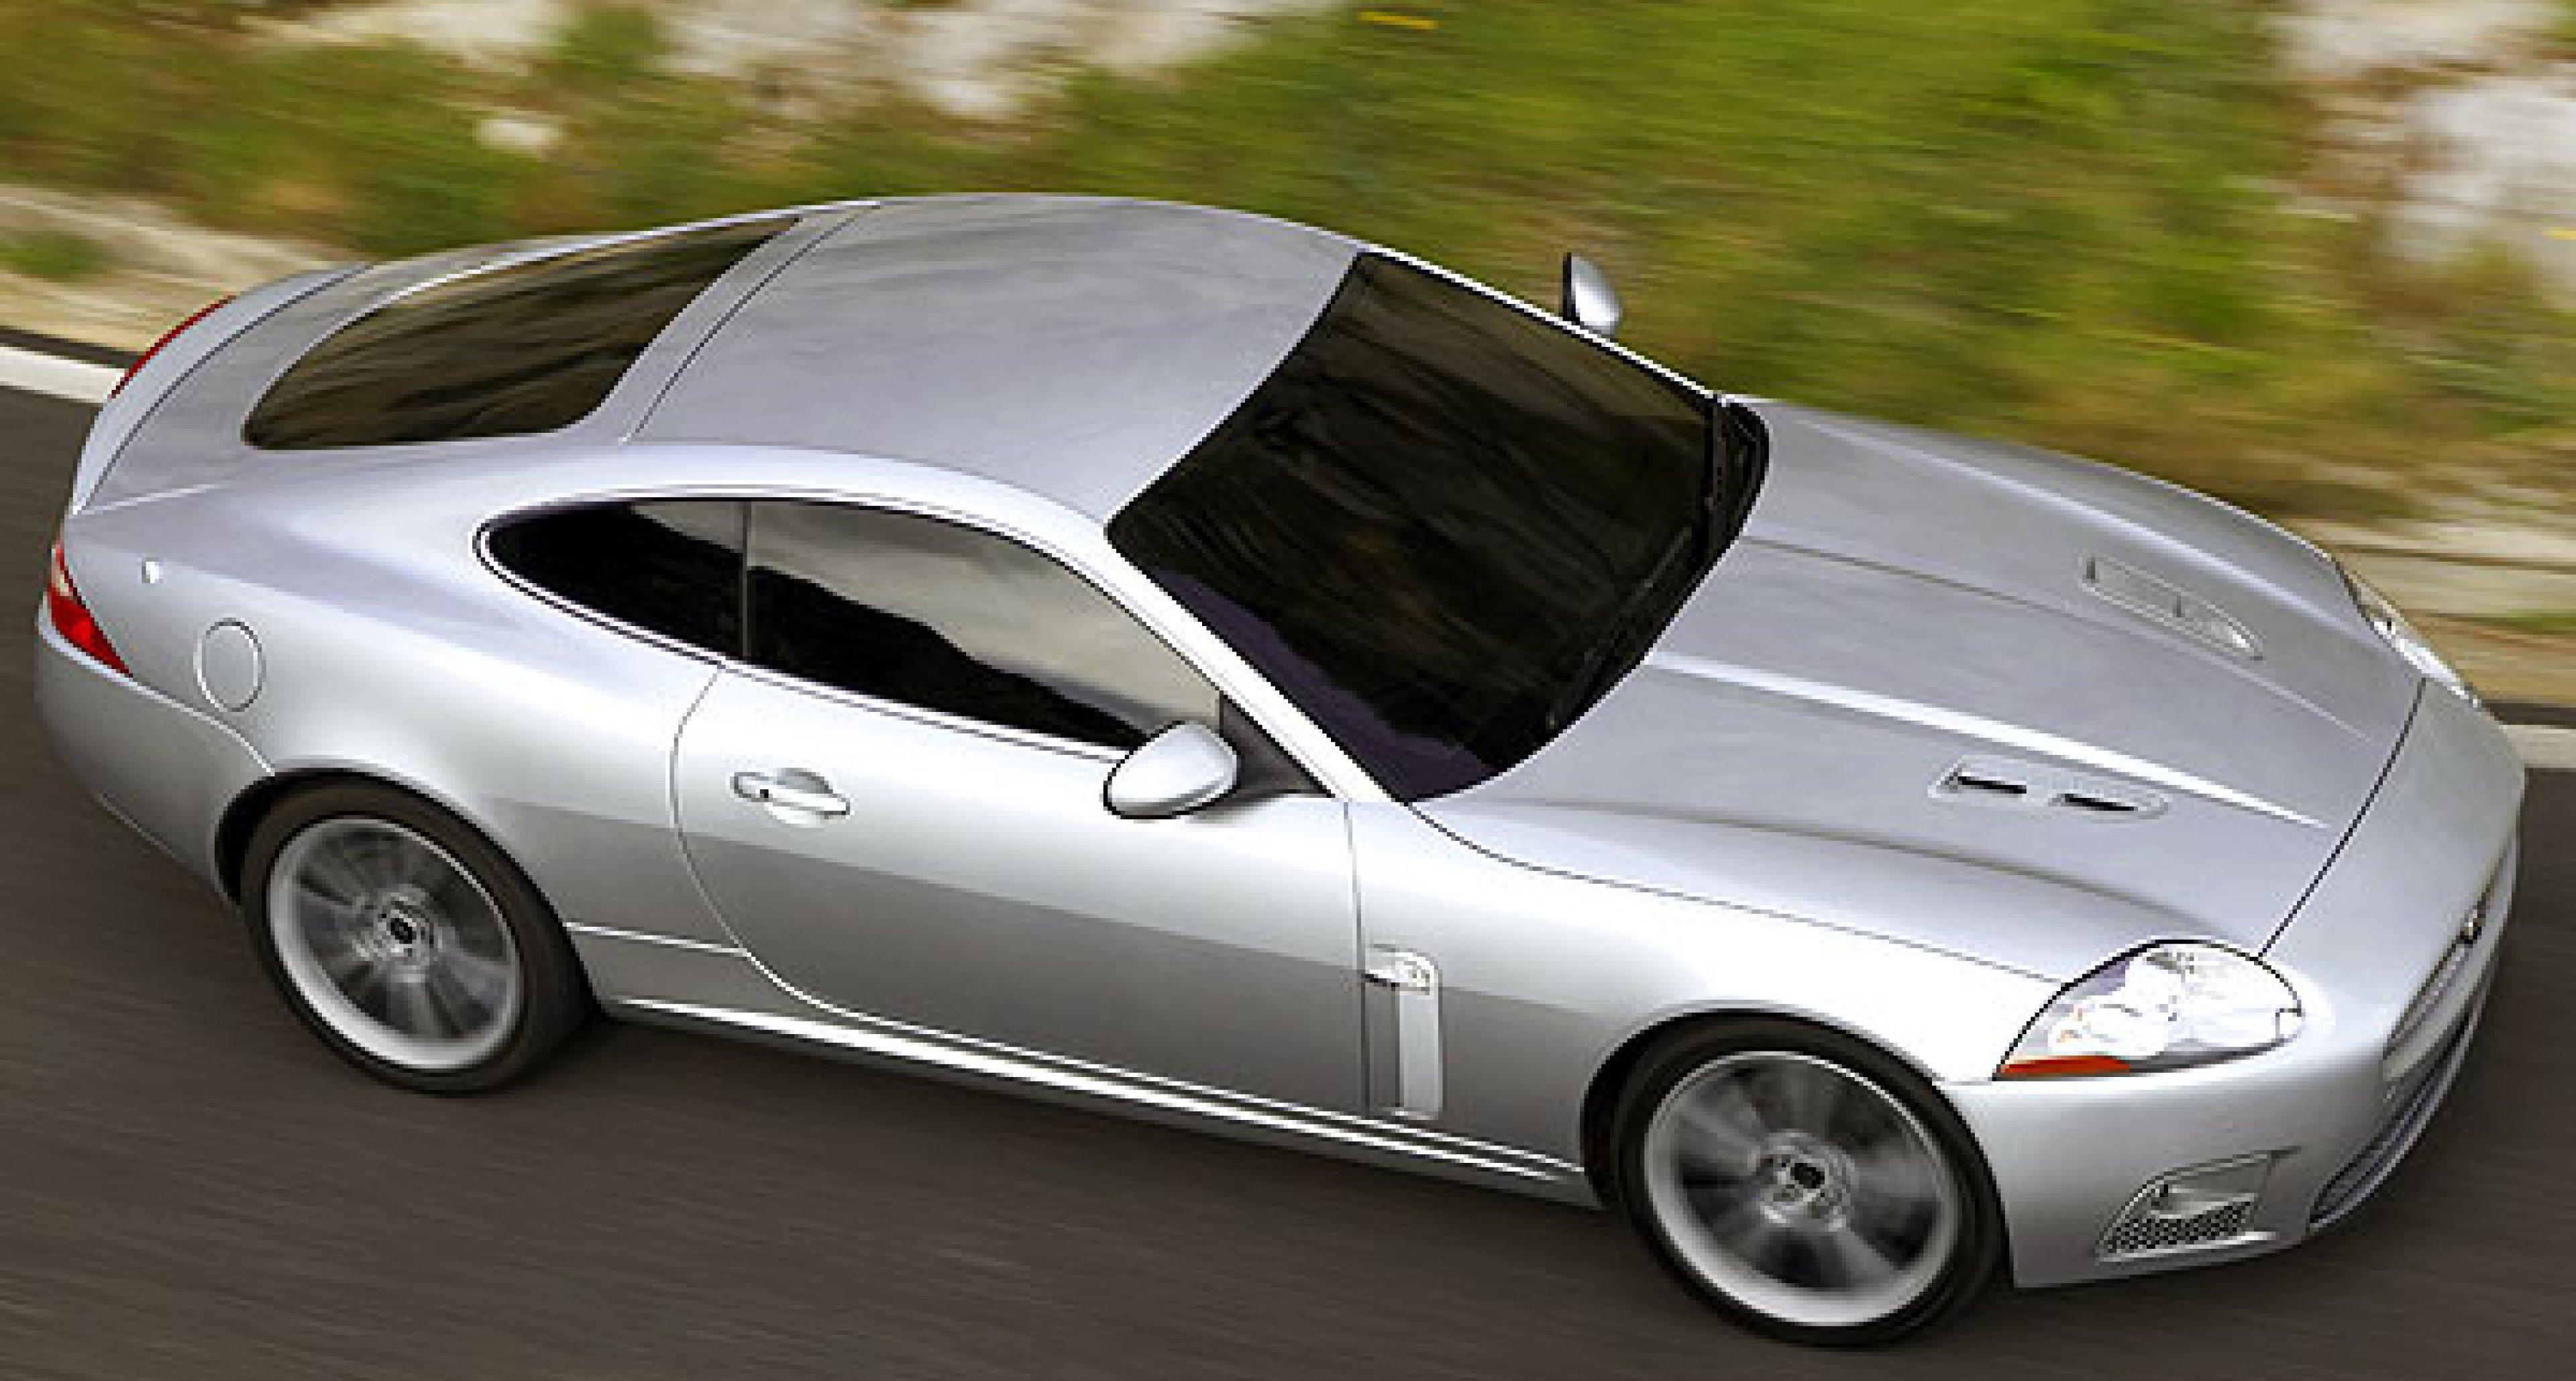 Jaguar XKR to debut in London